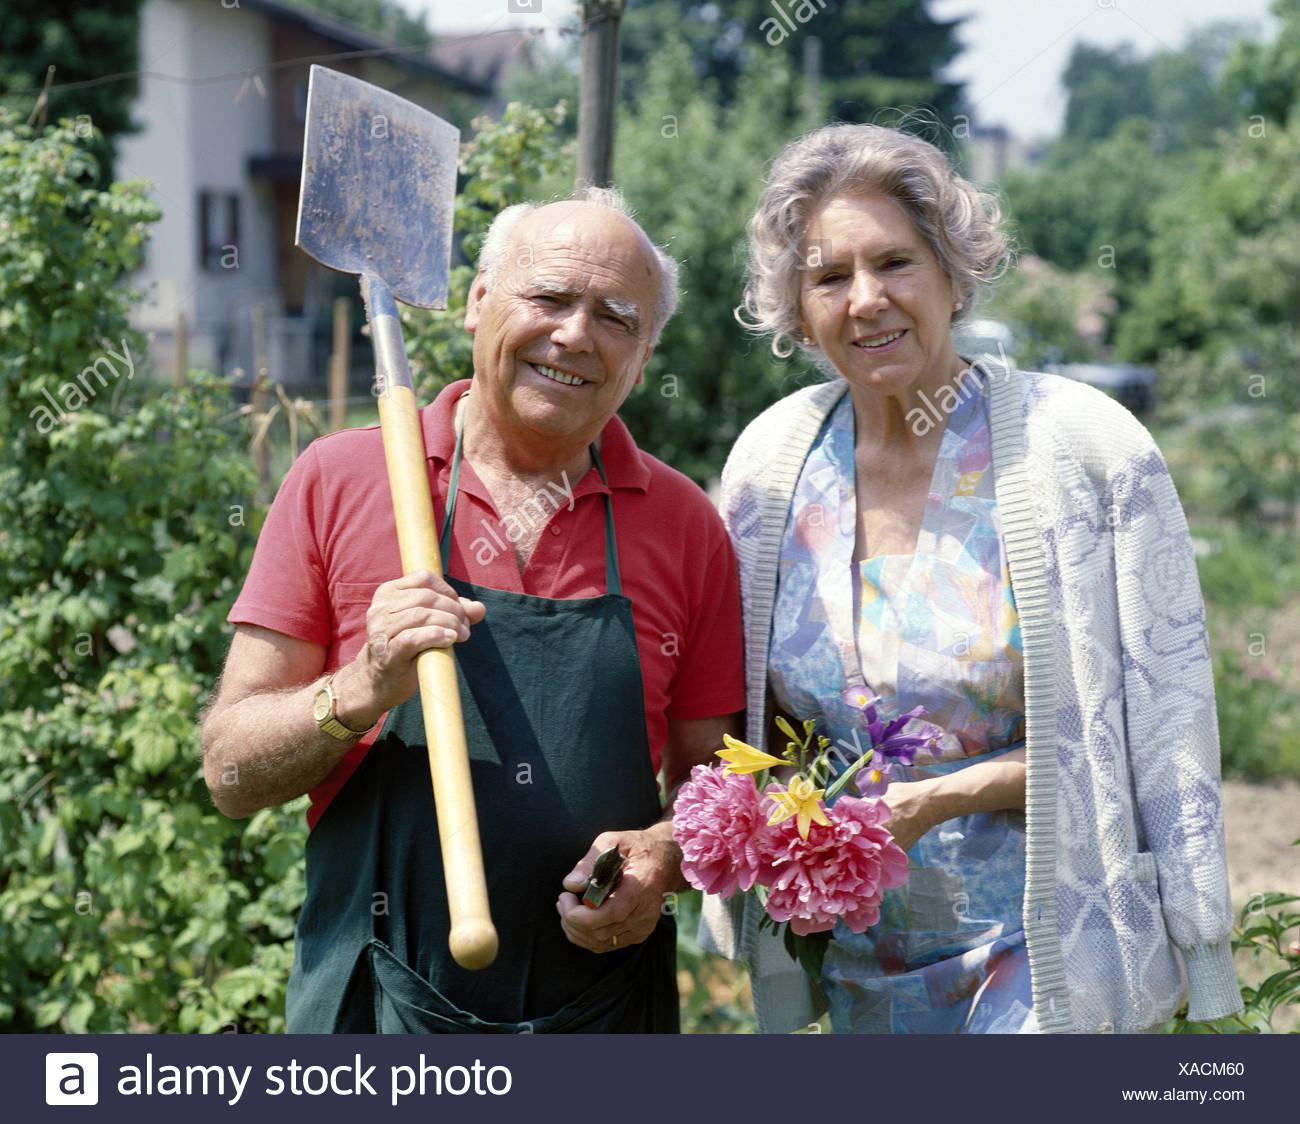 working clothes flowers garden amateur gardener pair couple seniors spavins spades - Stock Image